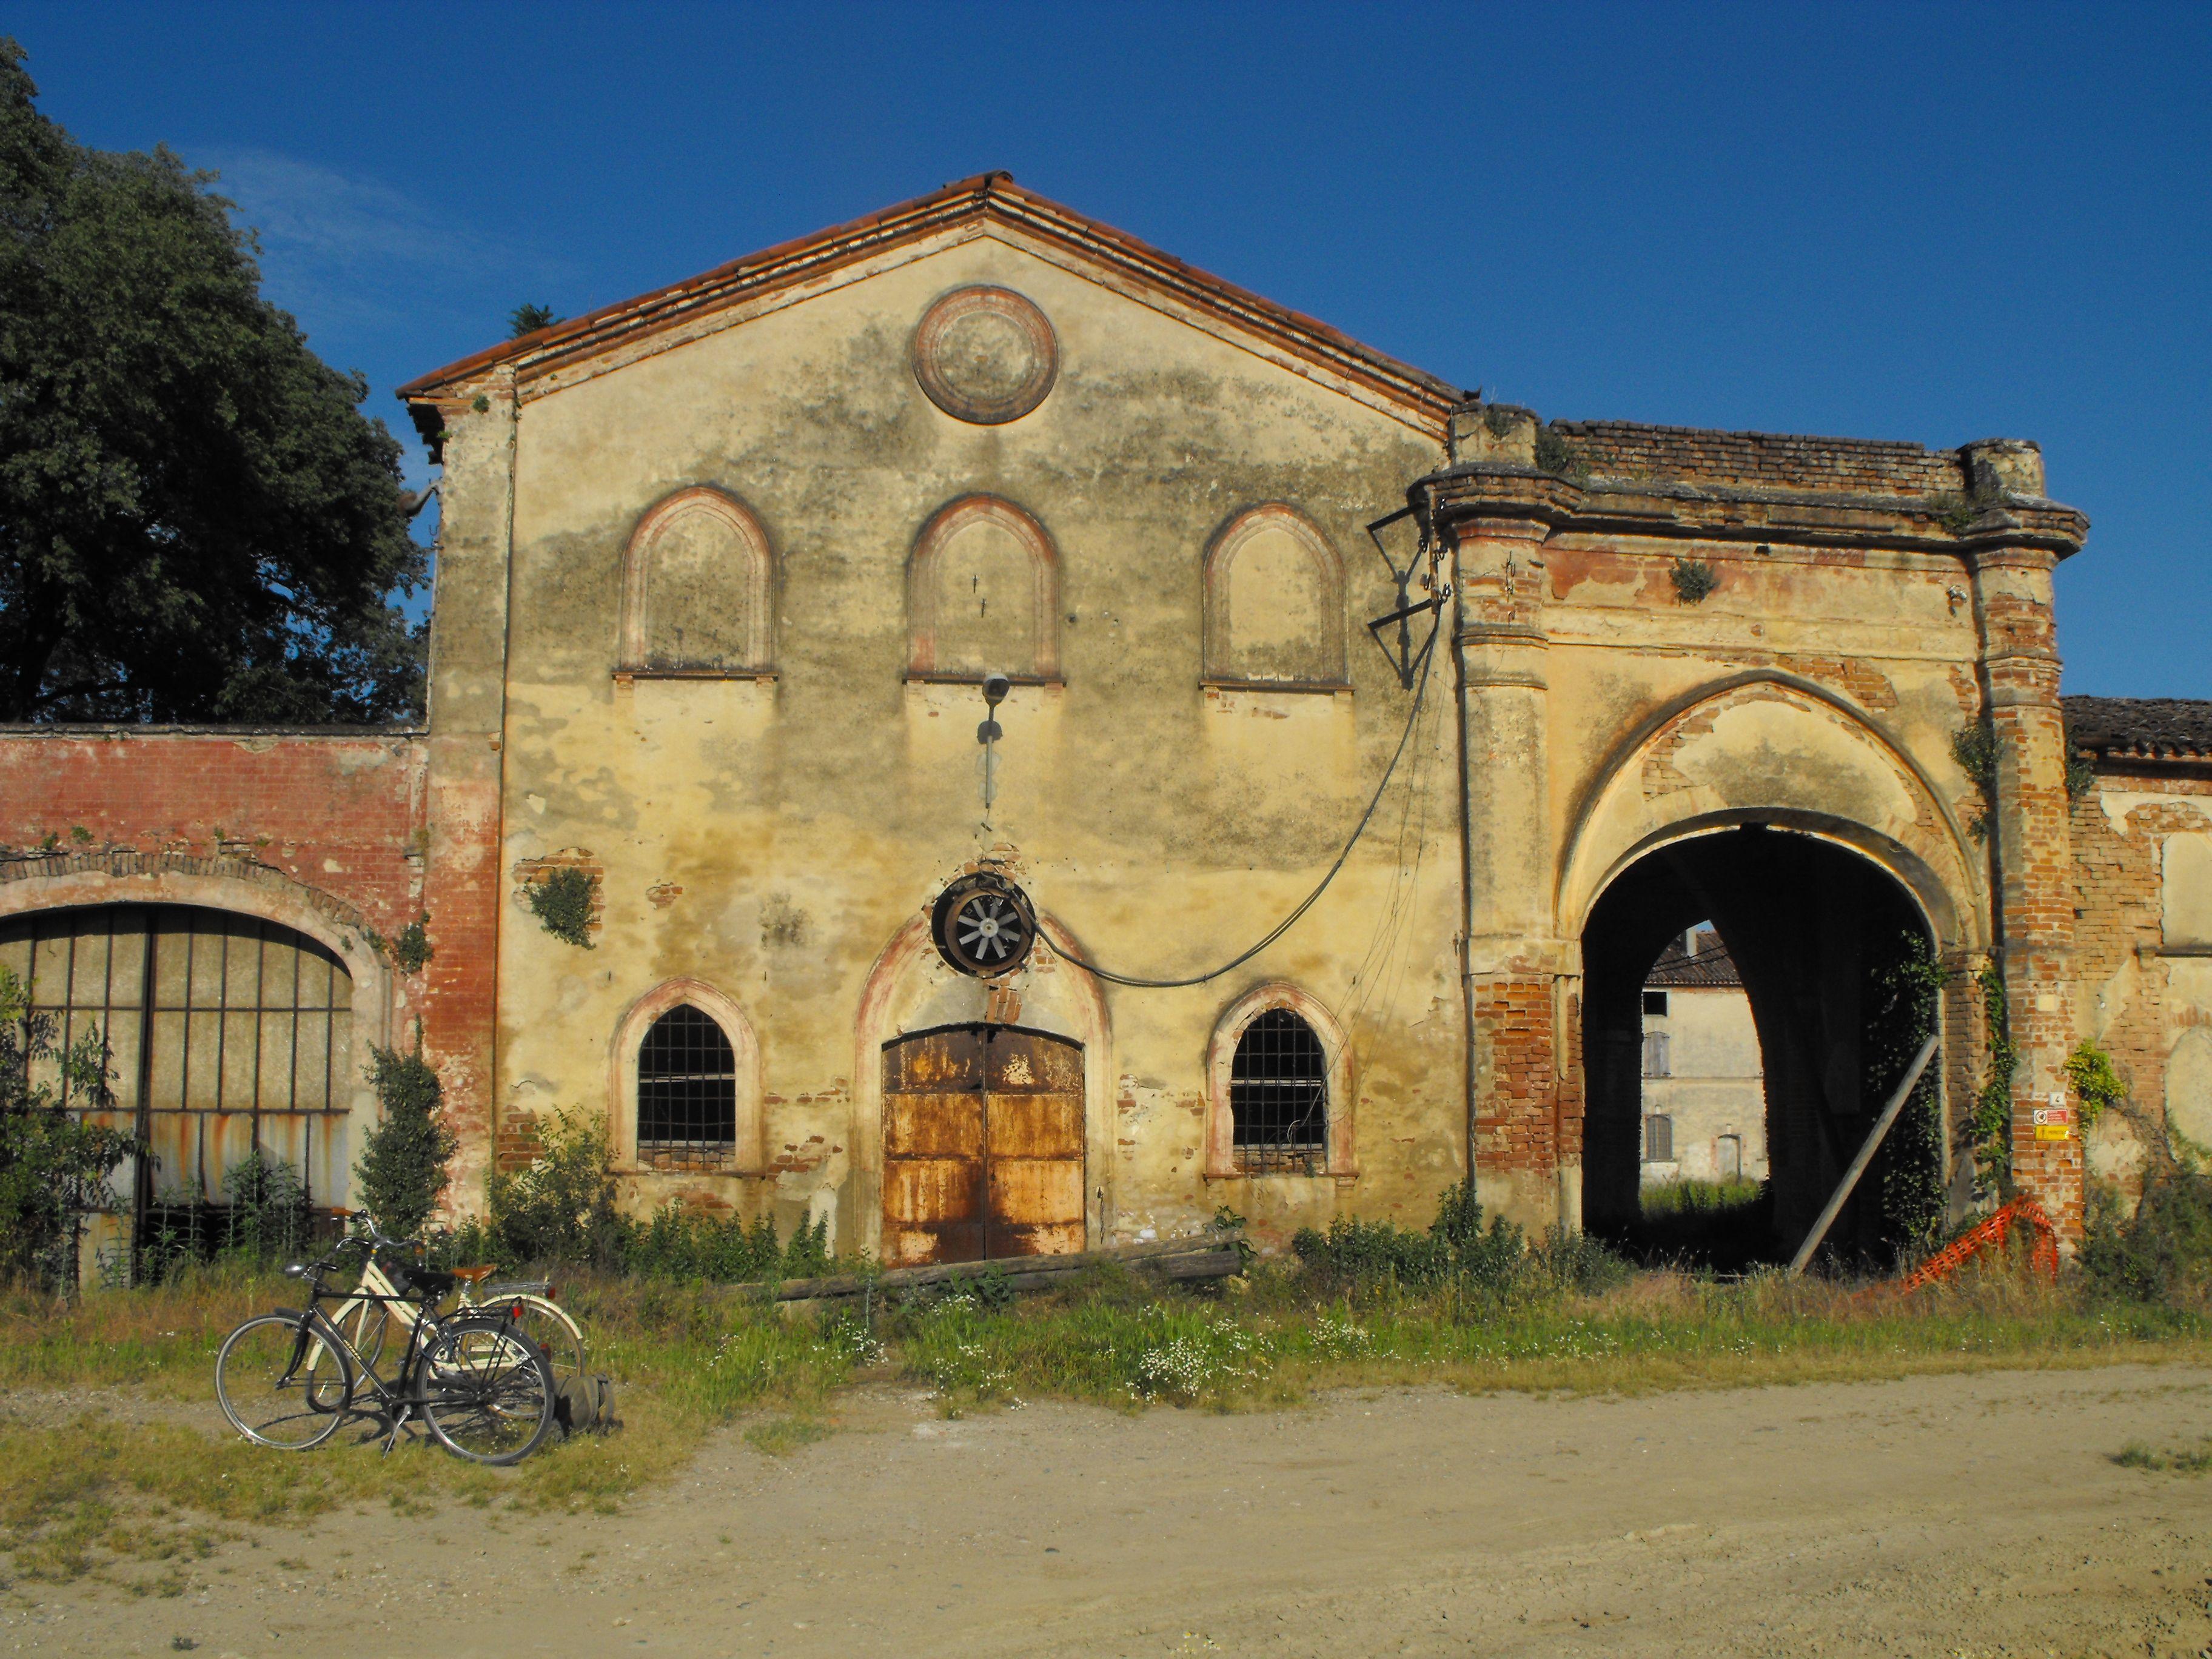 Entrata Cascina Alluvioni - 10 min by bike - 30 min by foot - 5 min by car